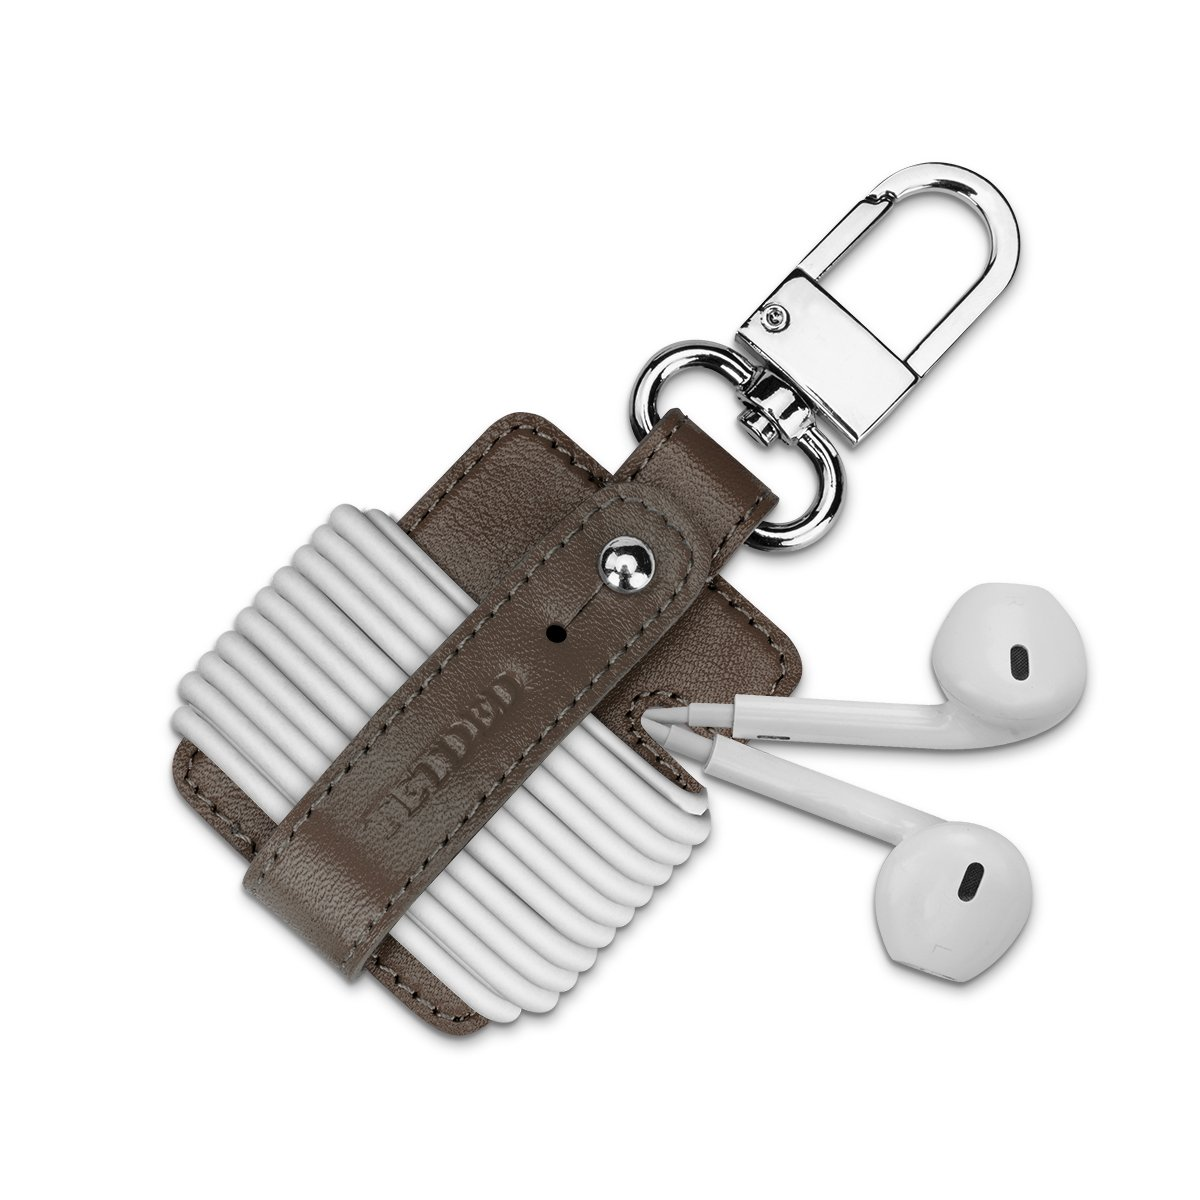 Tetded Premiumレザーイヤホンholder002 ,コードオーガナイザー ブラウン KN_EH002  Nappa Dark Brown B07DJ8K7GR